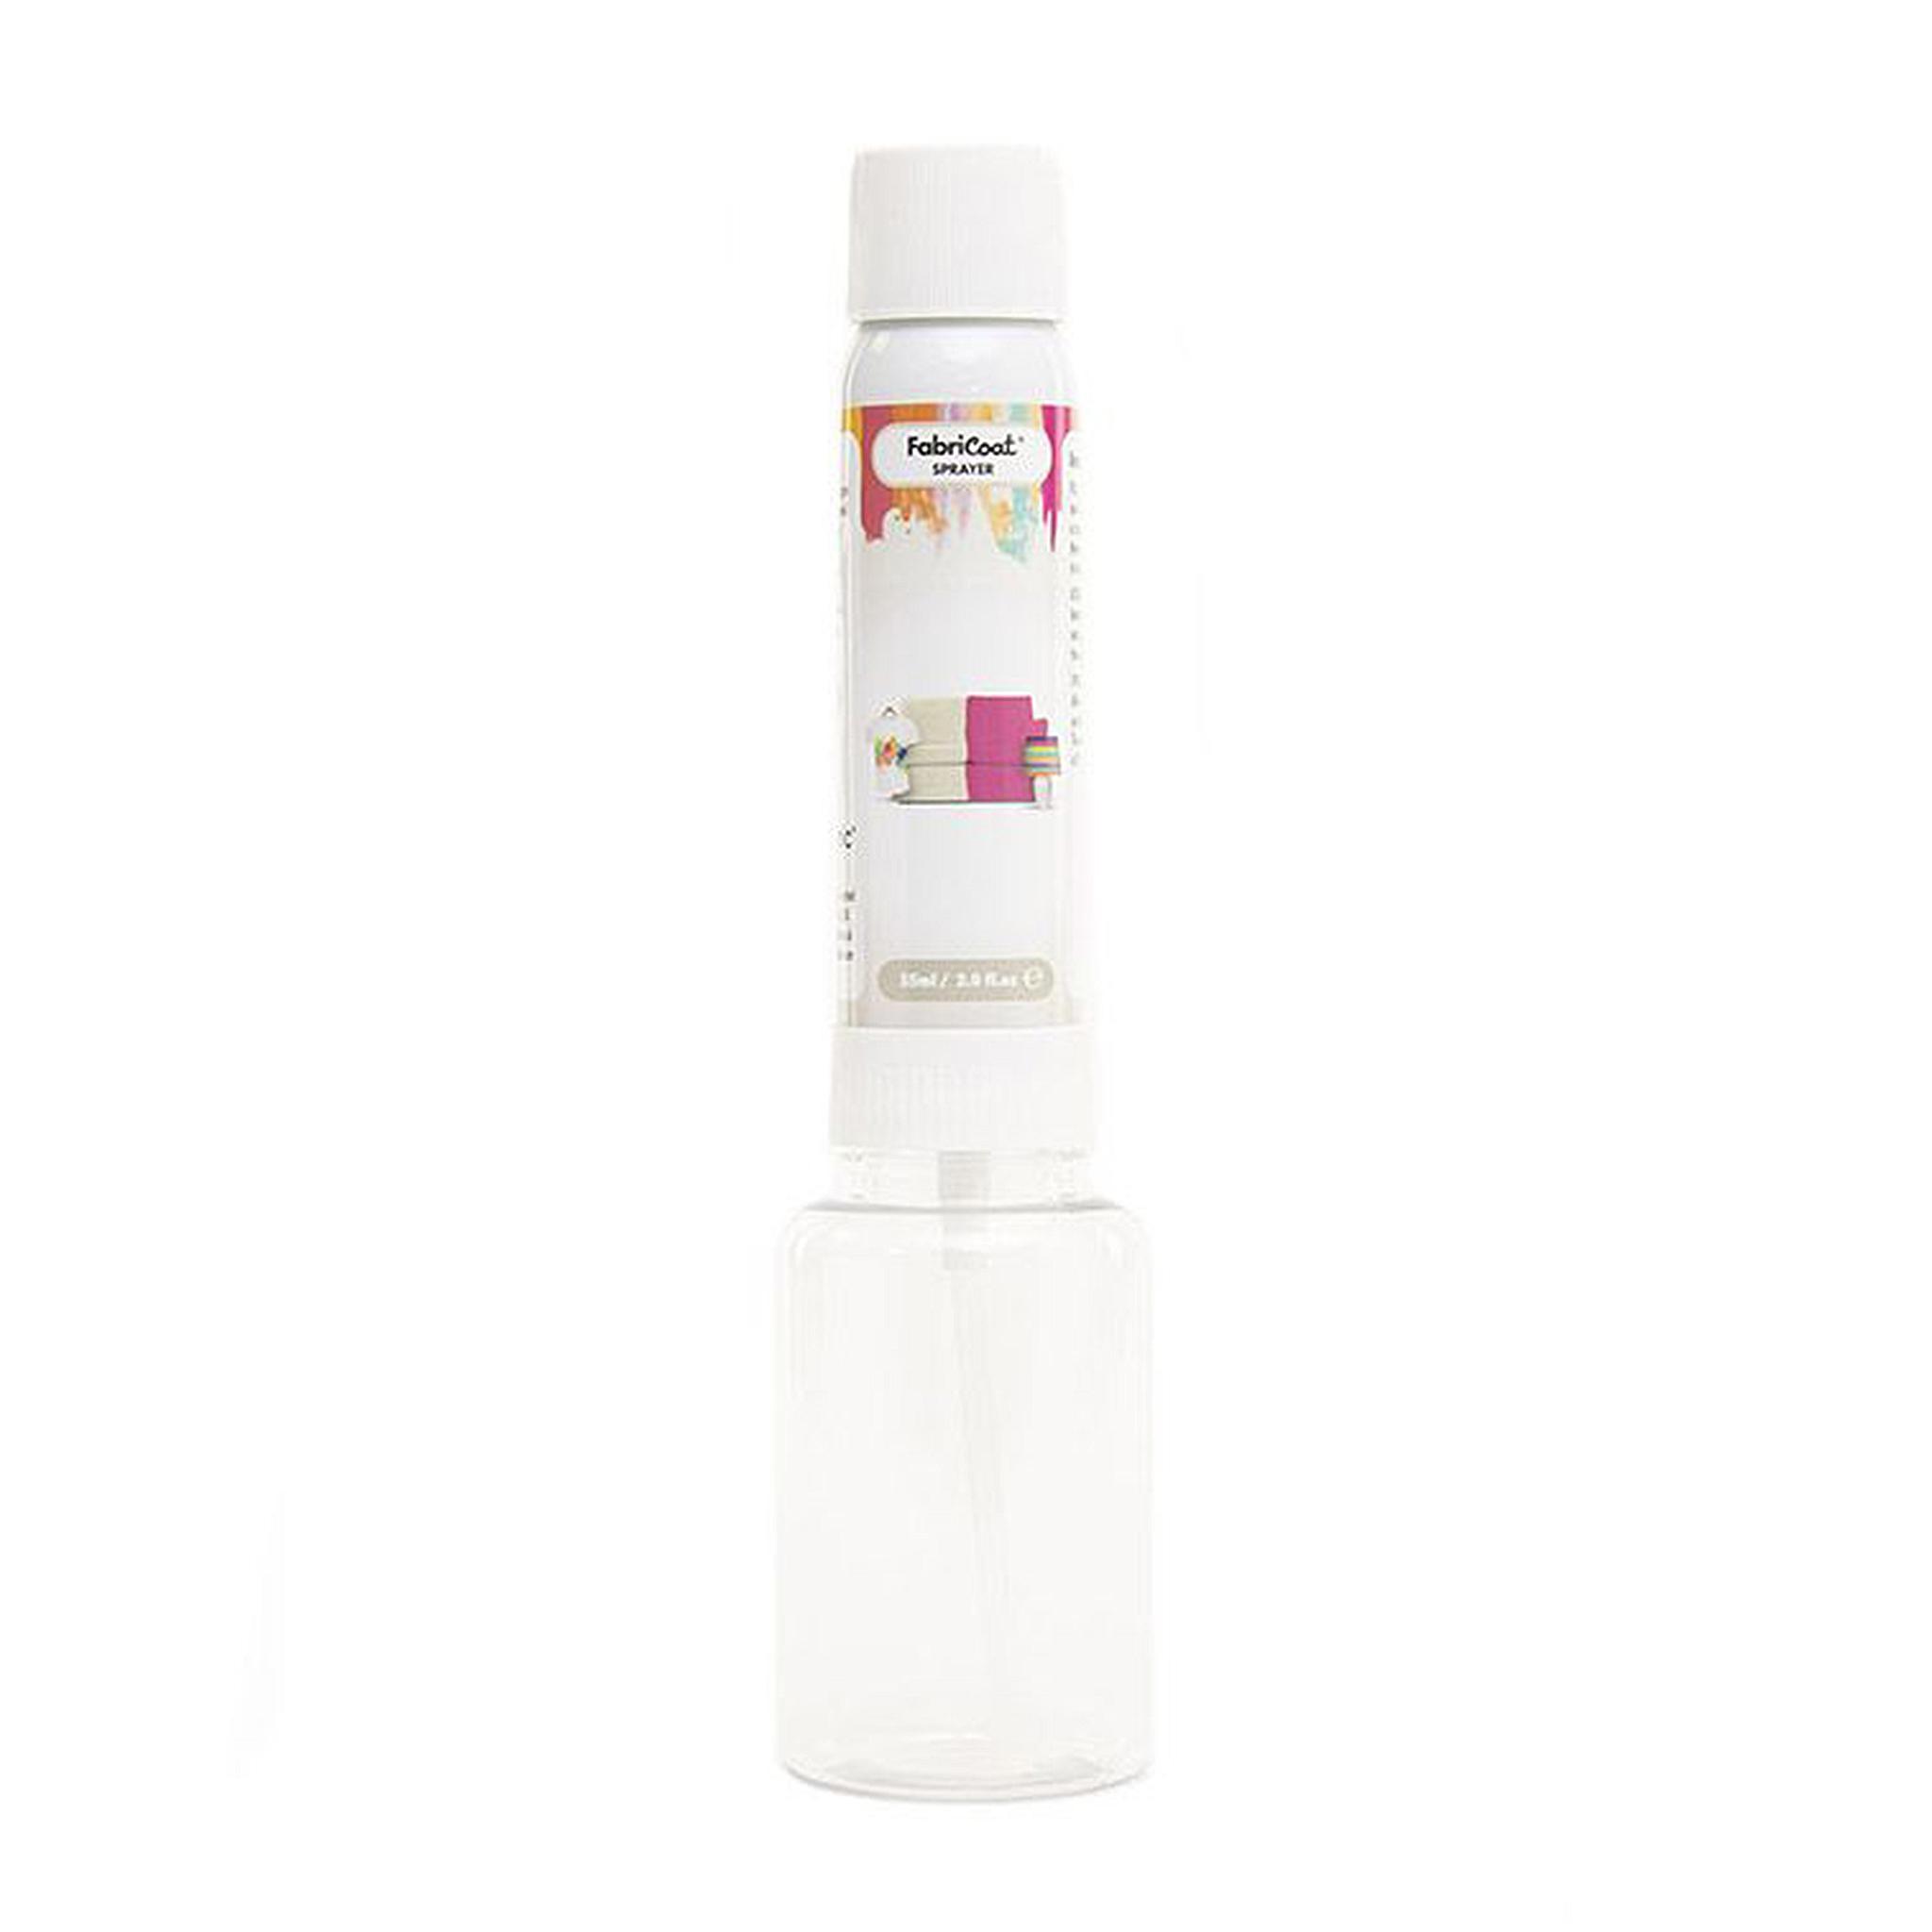 Sprayflaska Furniture Clinic Fabricoat Sprayer